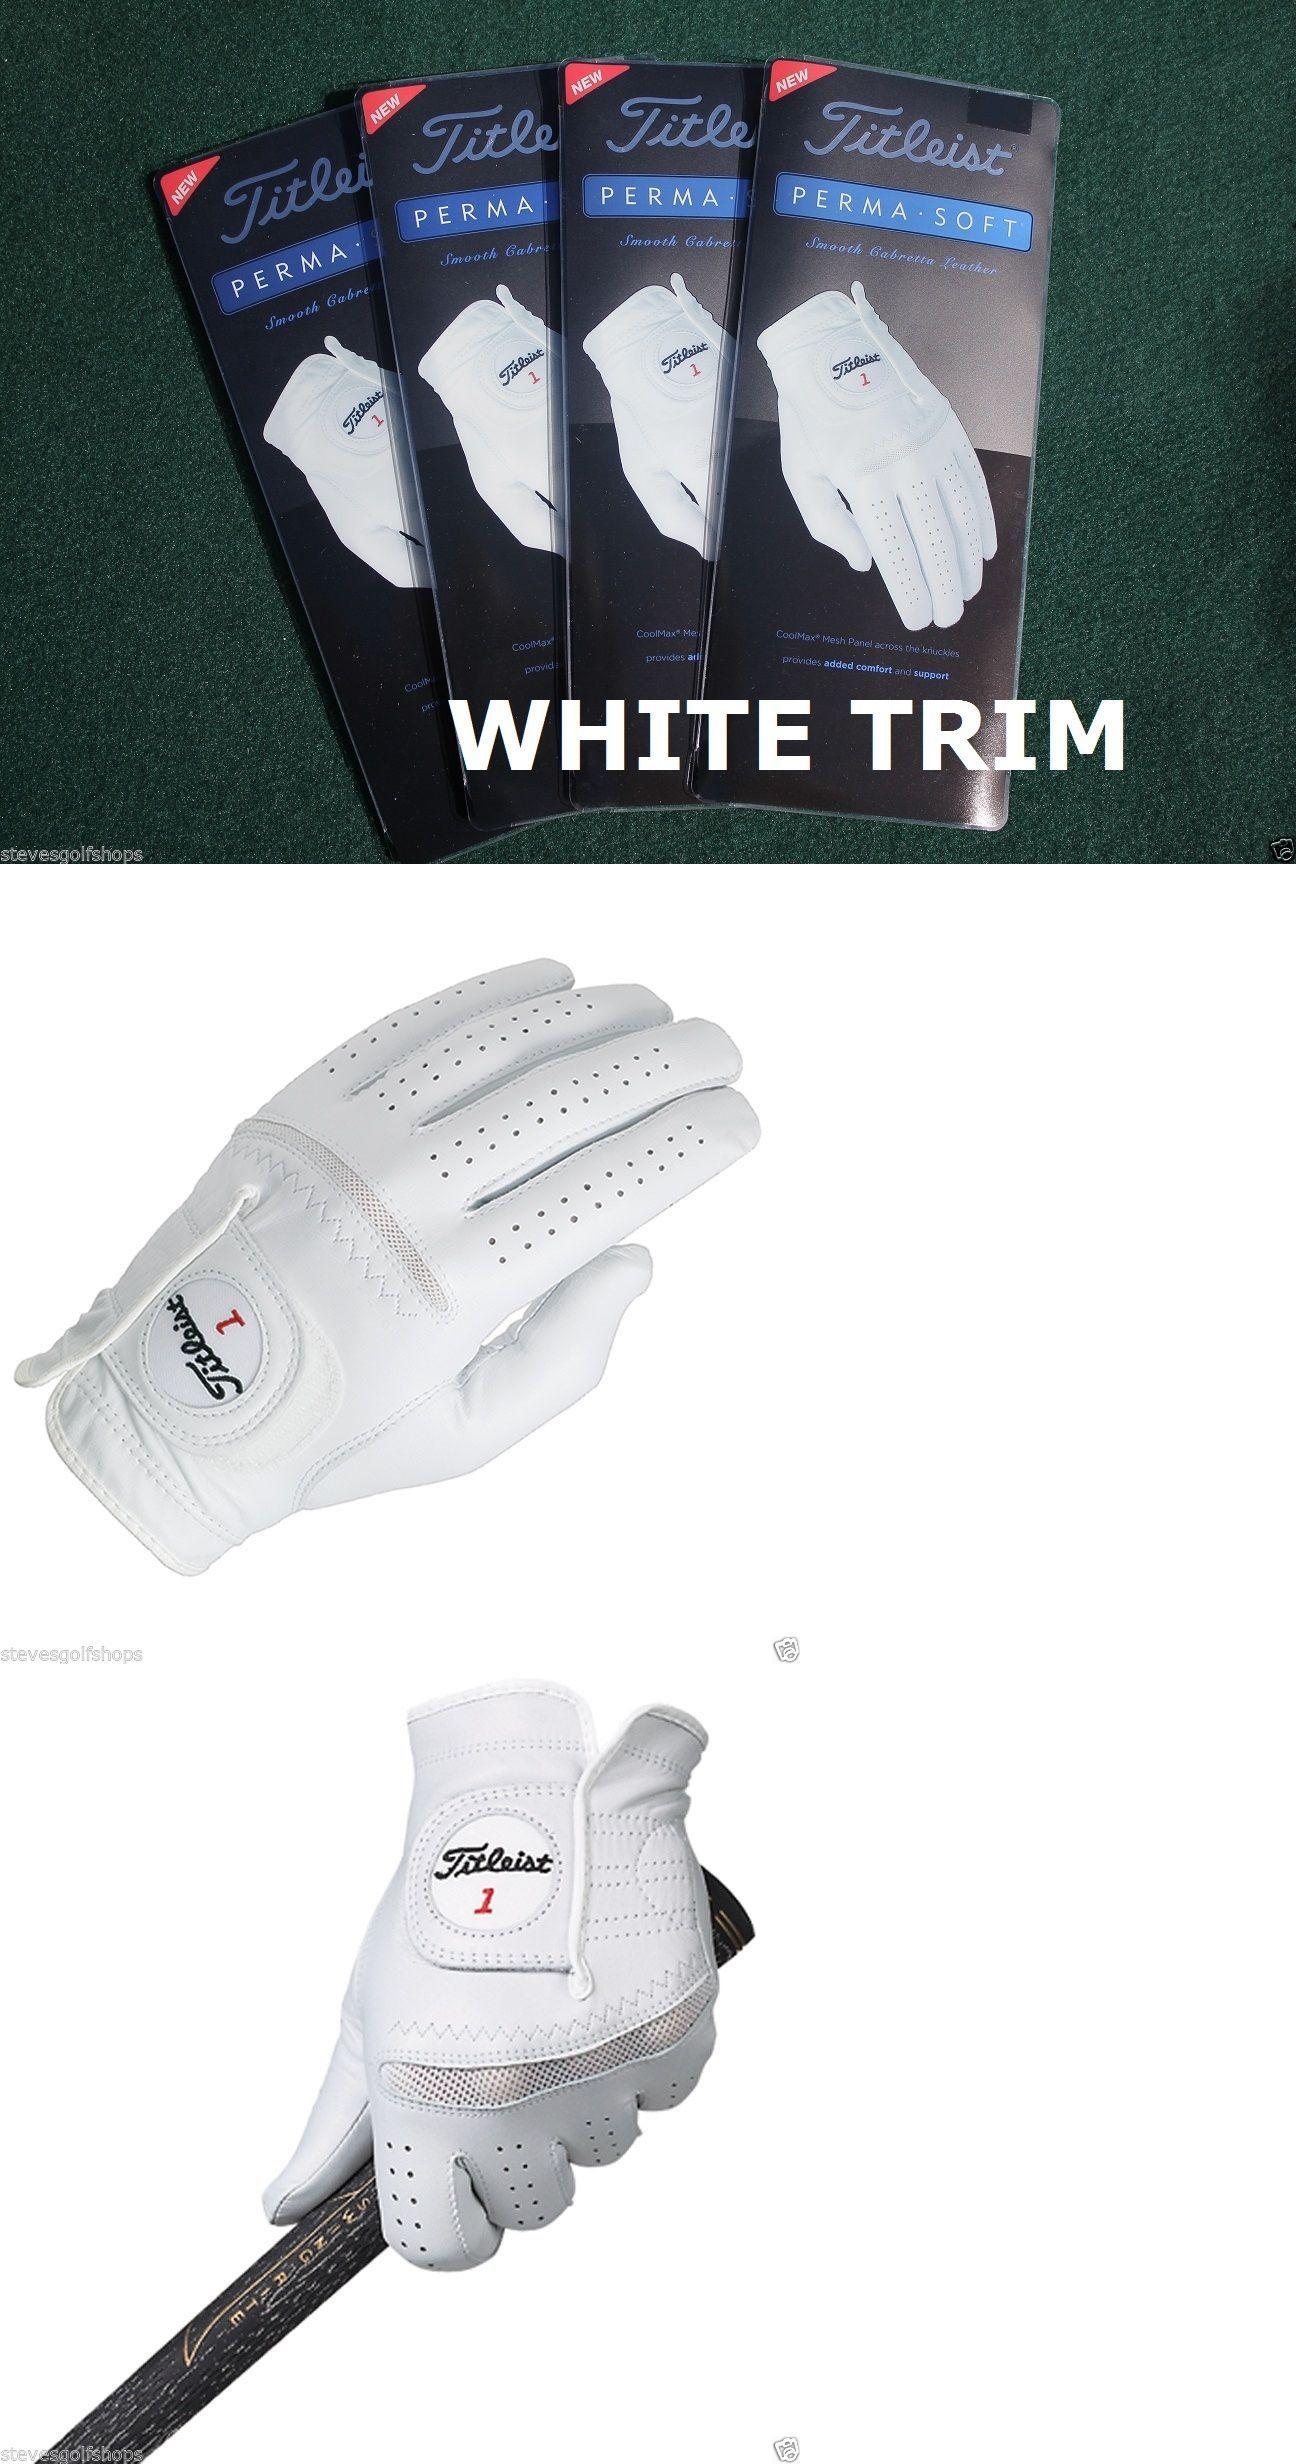 Mens gloves cadet - Golf Gloves 181135 4 New Titleist 2016 Perma Soft Golf Gloves Mens Cadet Large